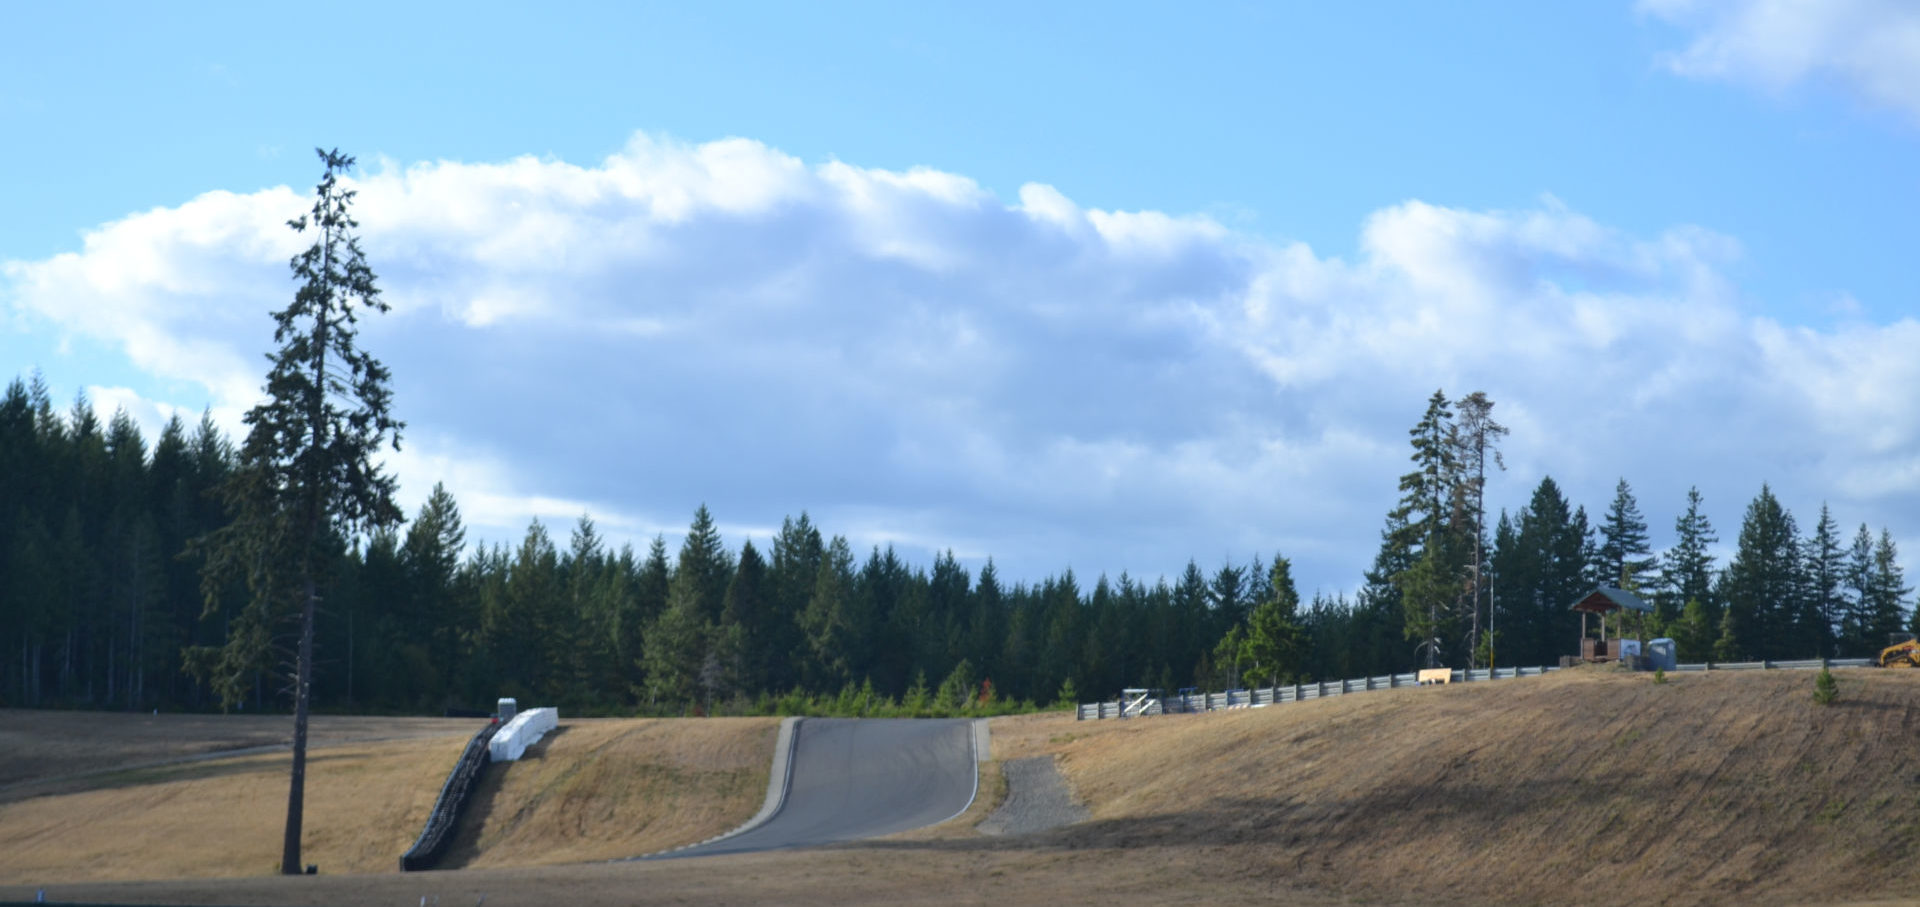 Ridge Motorsports Park. Photo by David Swarts.